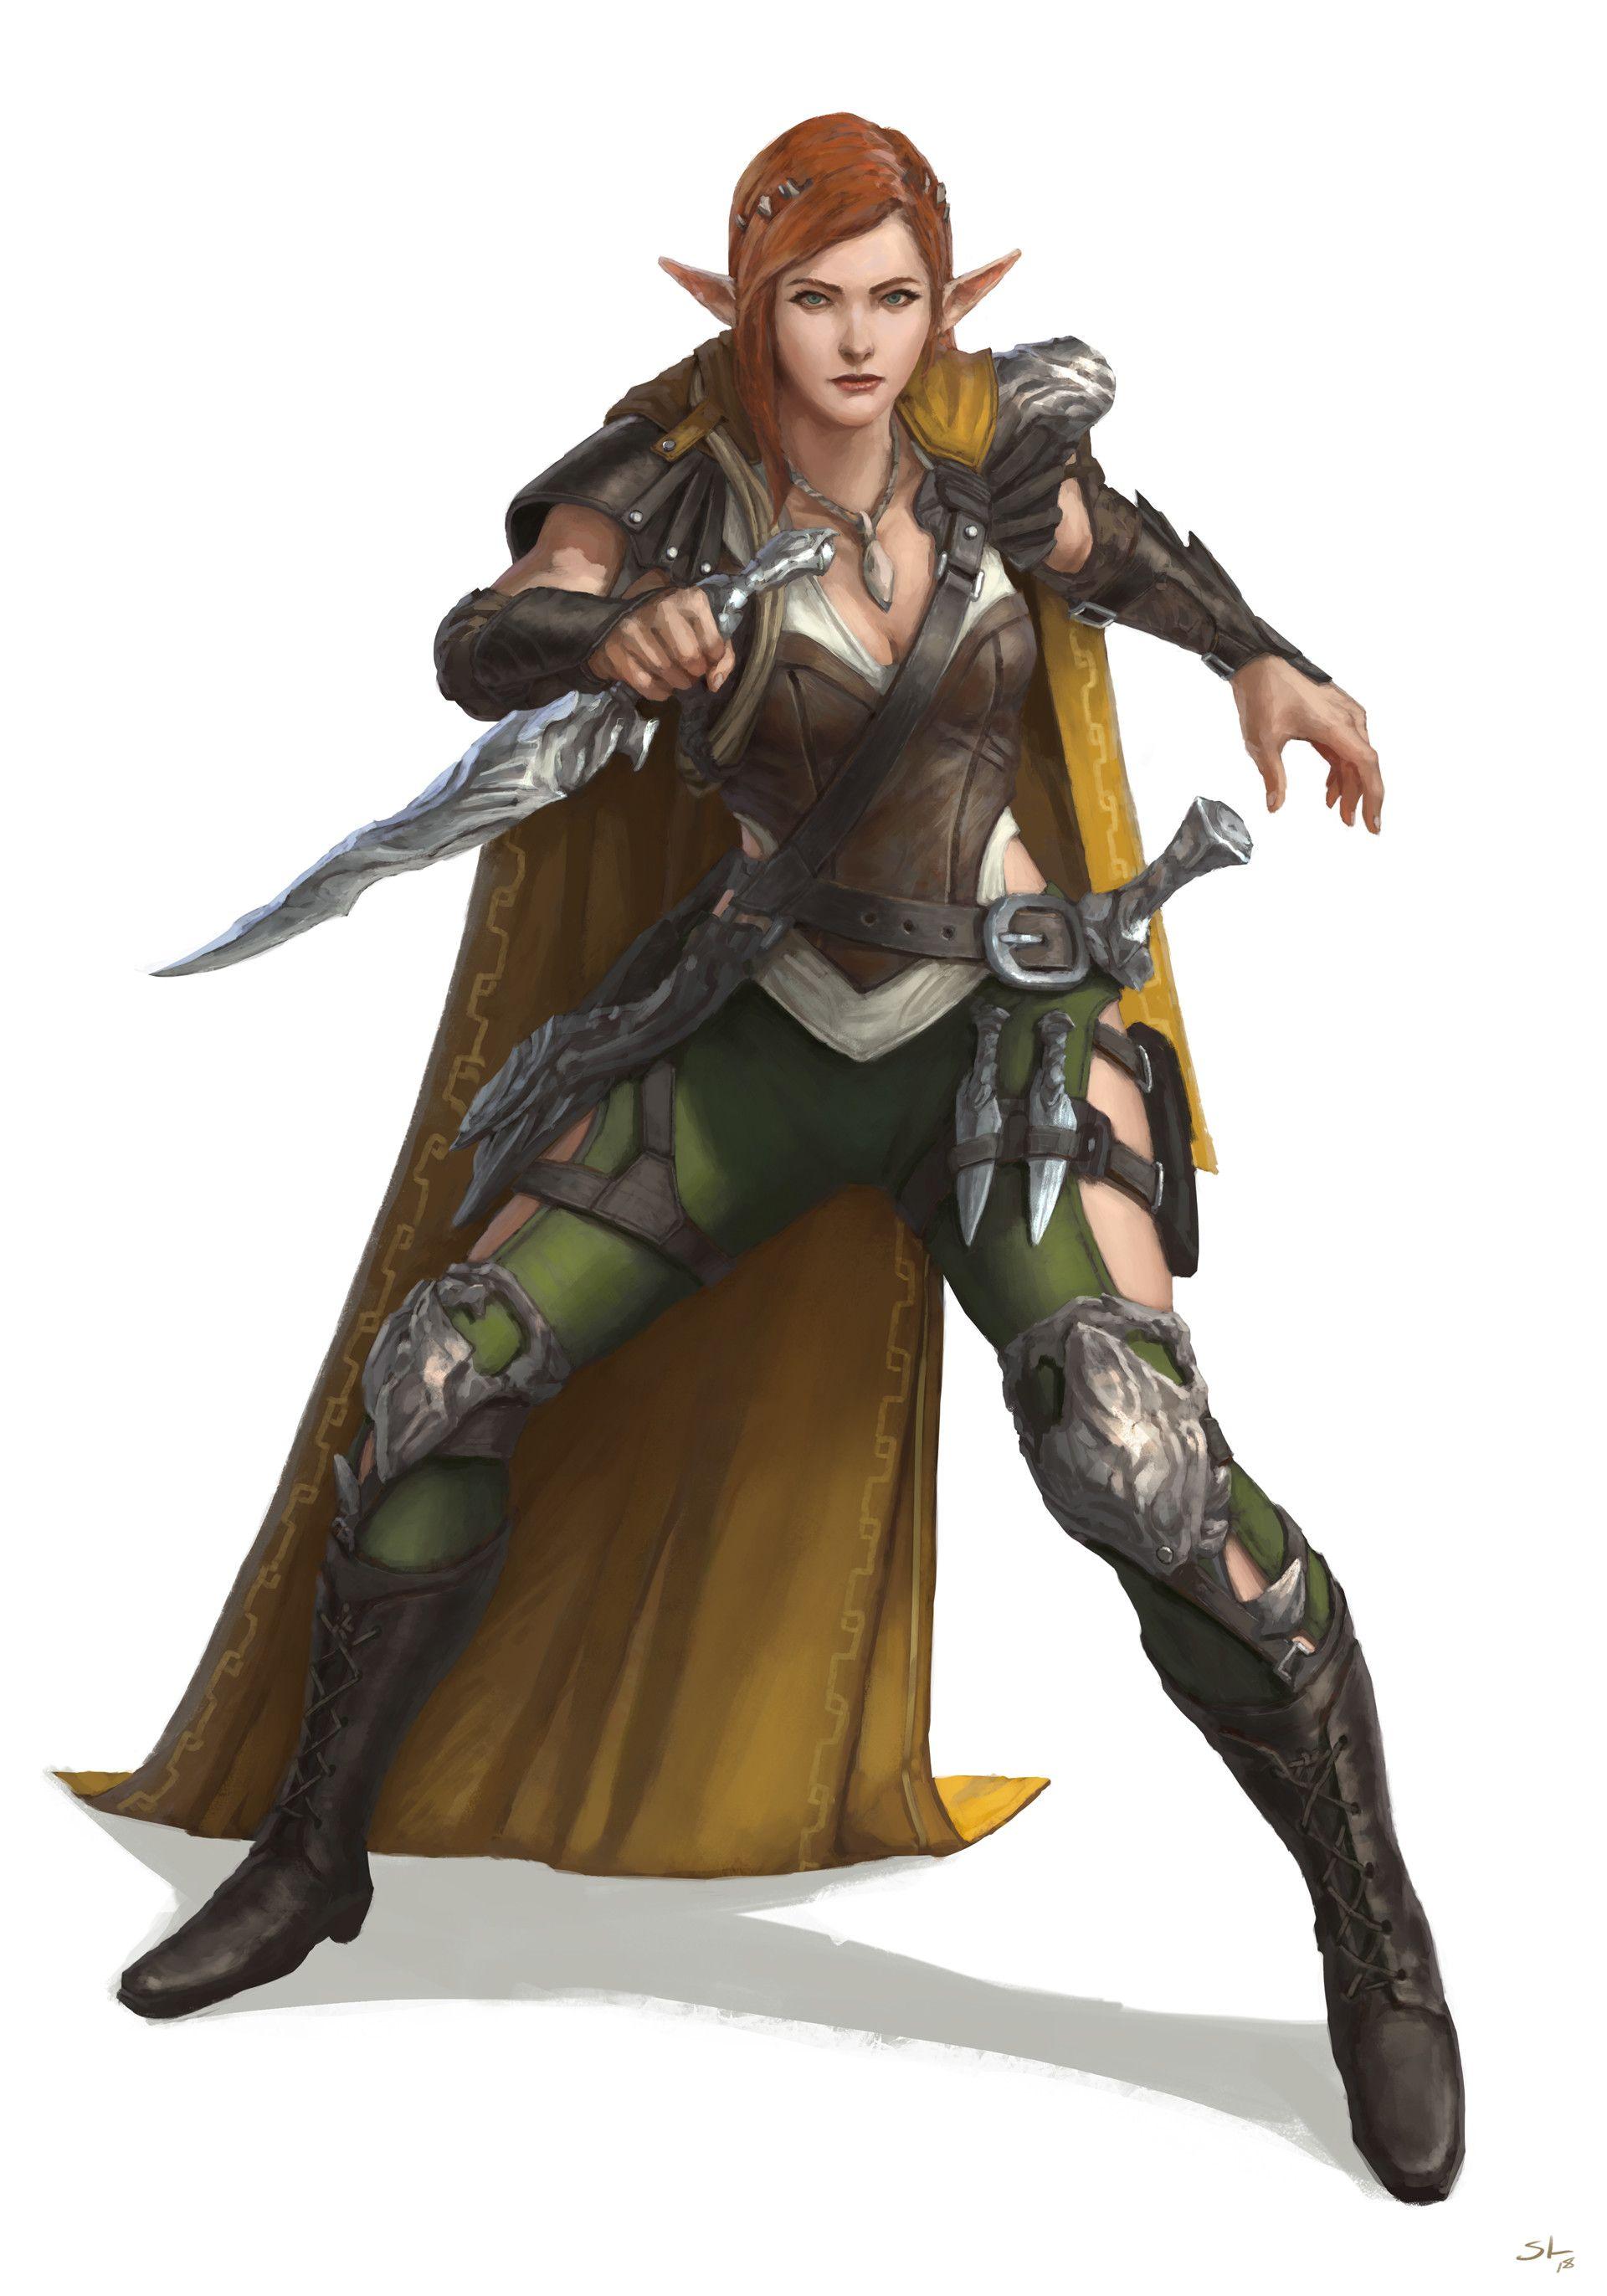 ArtStation - Rogue girl character, Sam Leung   OC ideas in